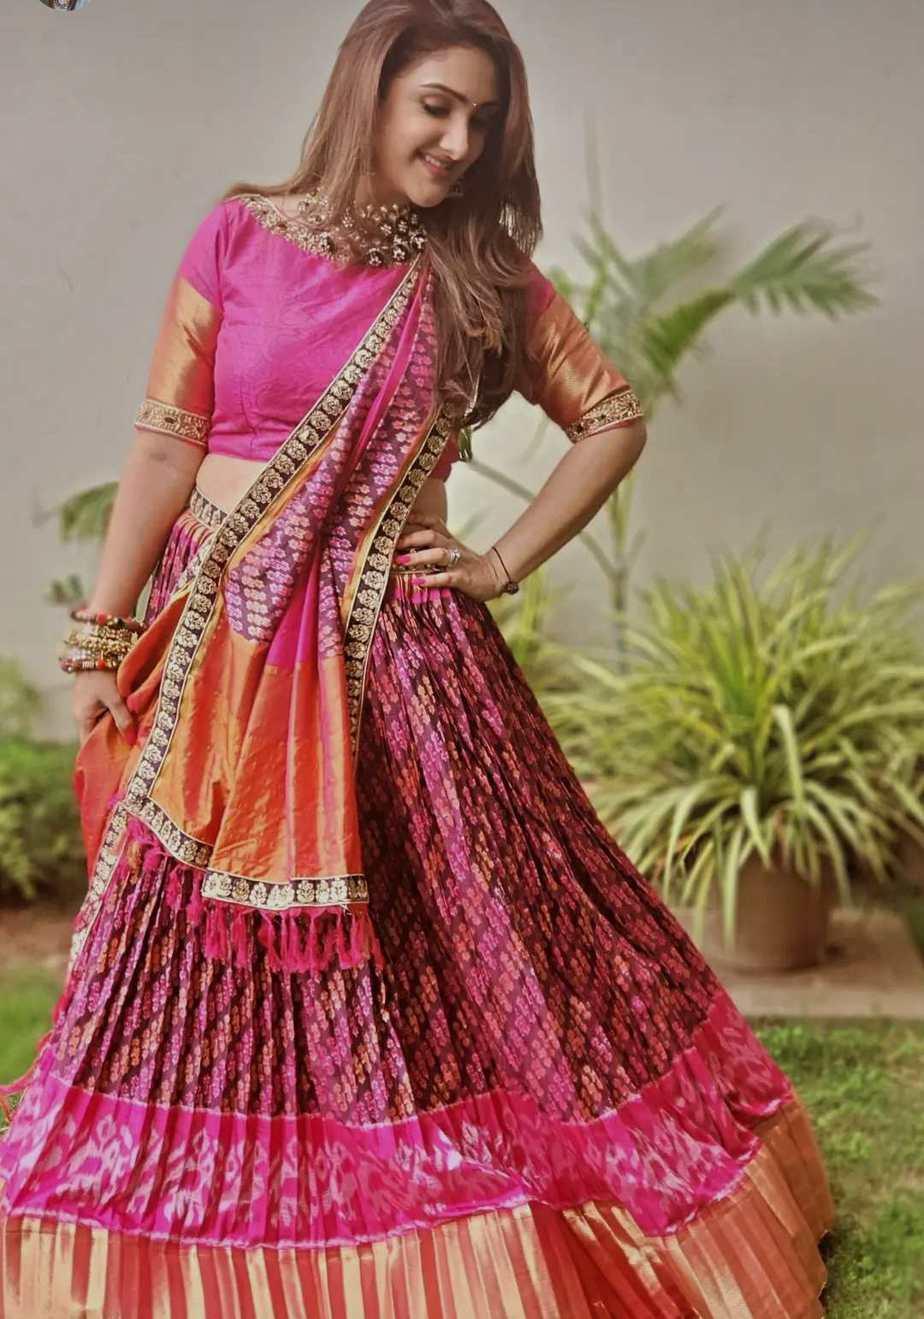 sridevi Vijaykumar in pink patola leehnga by Neeru's for comedy stars-5